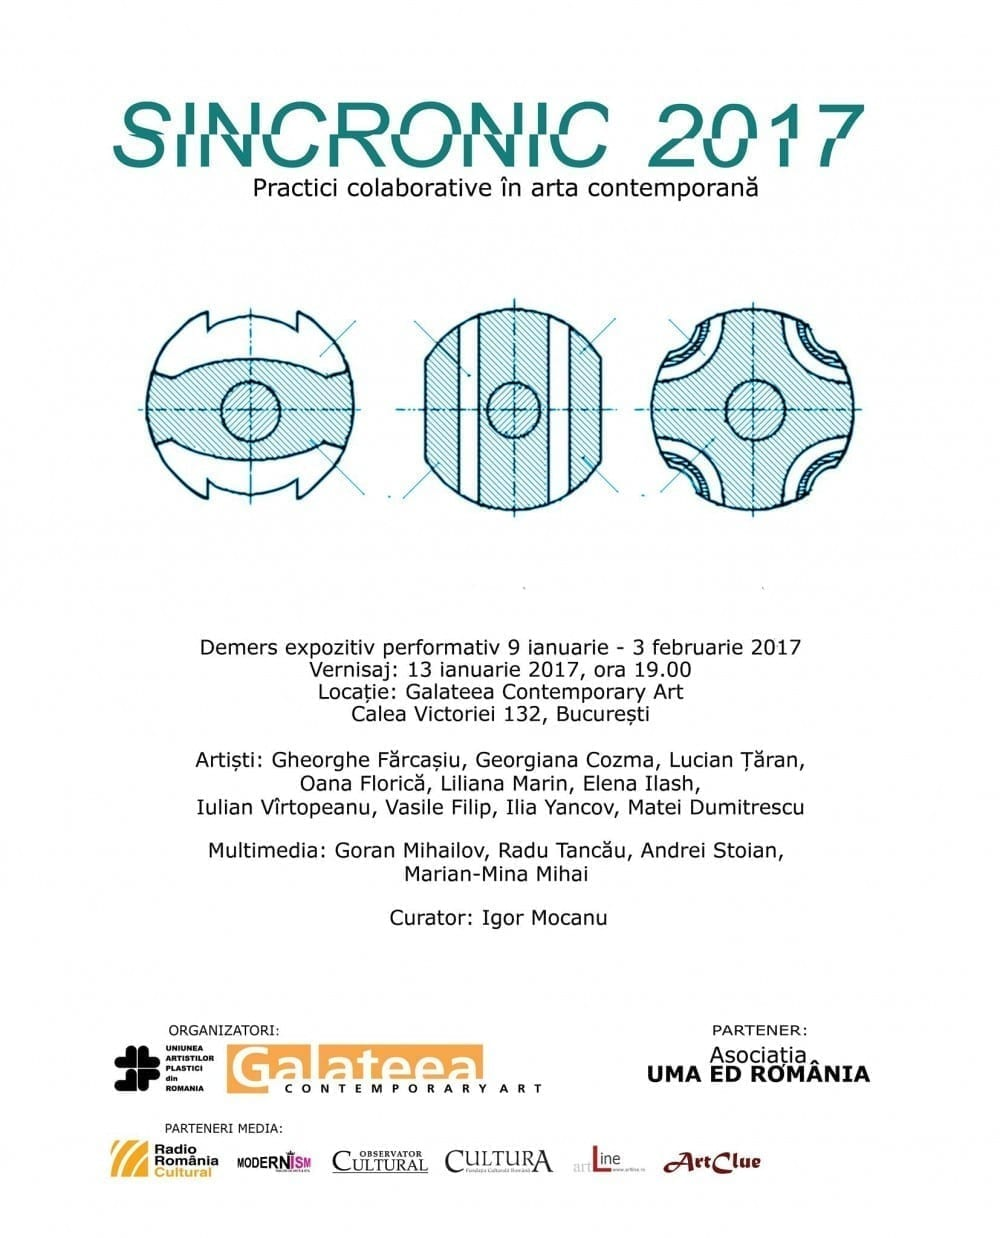 SinCronic 2017 @ Galateea Contemporary Art